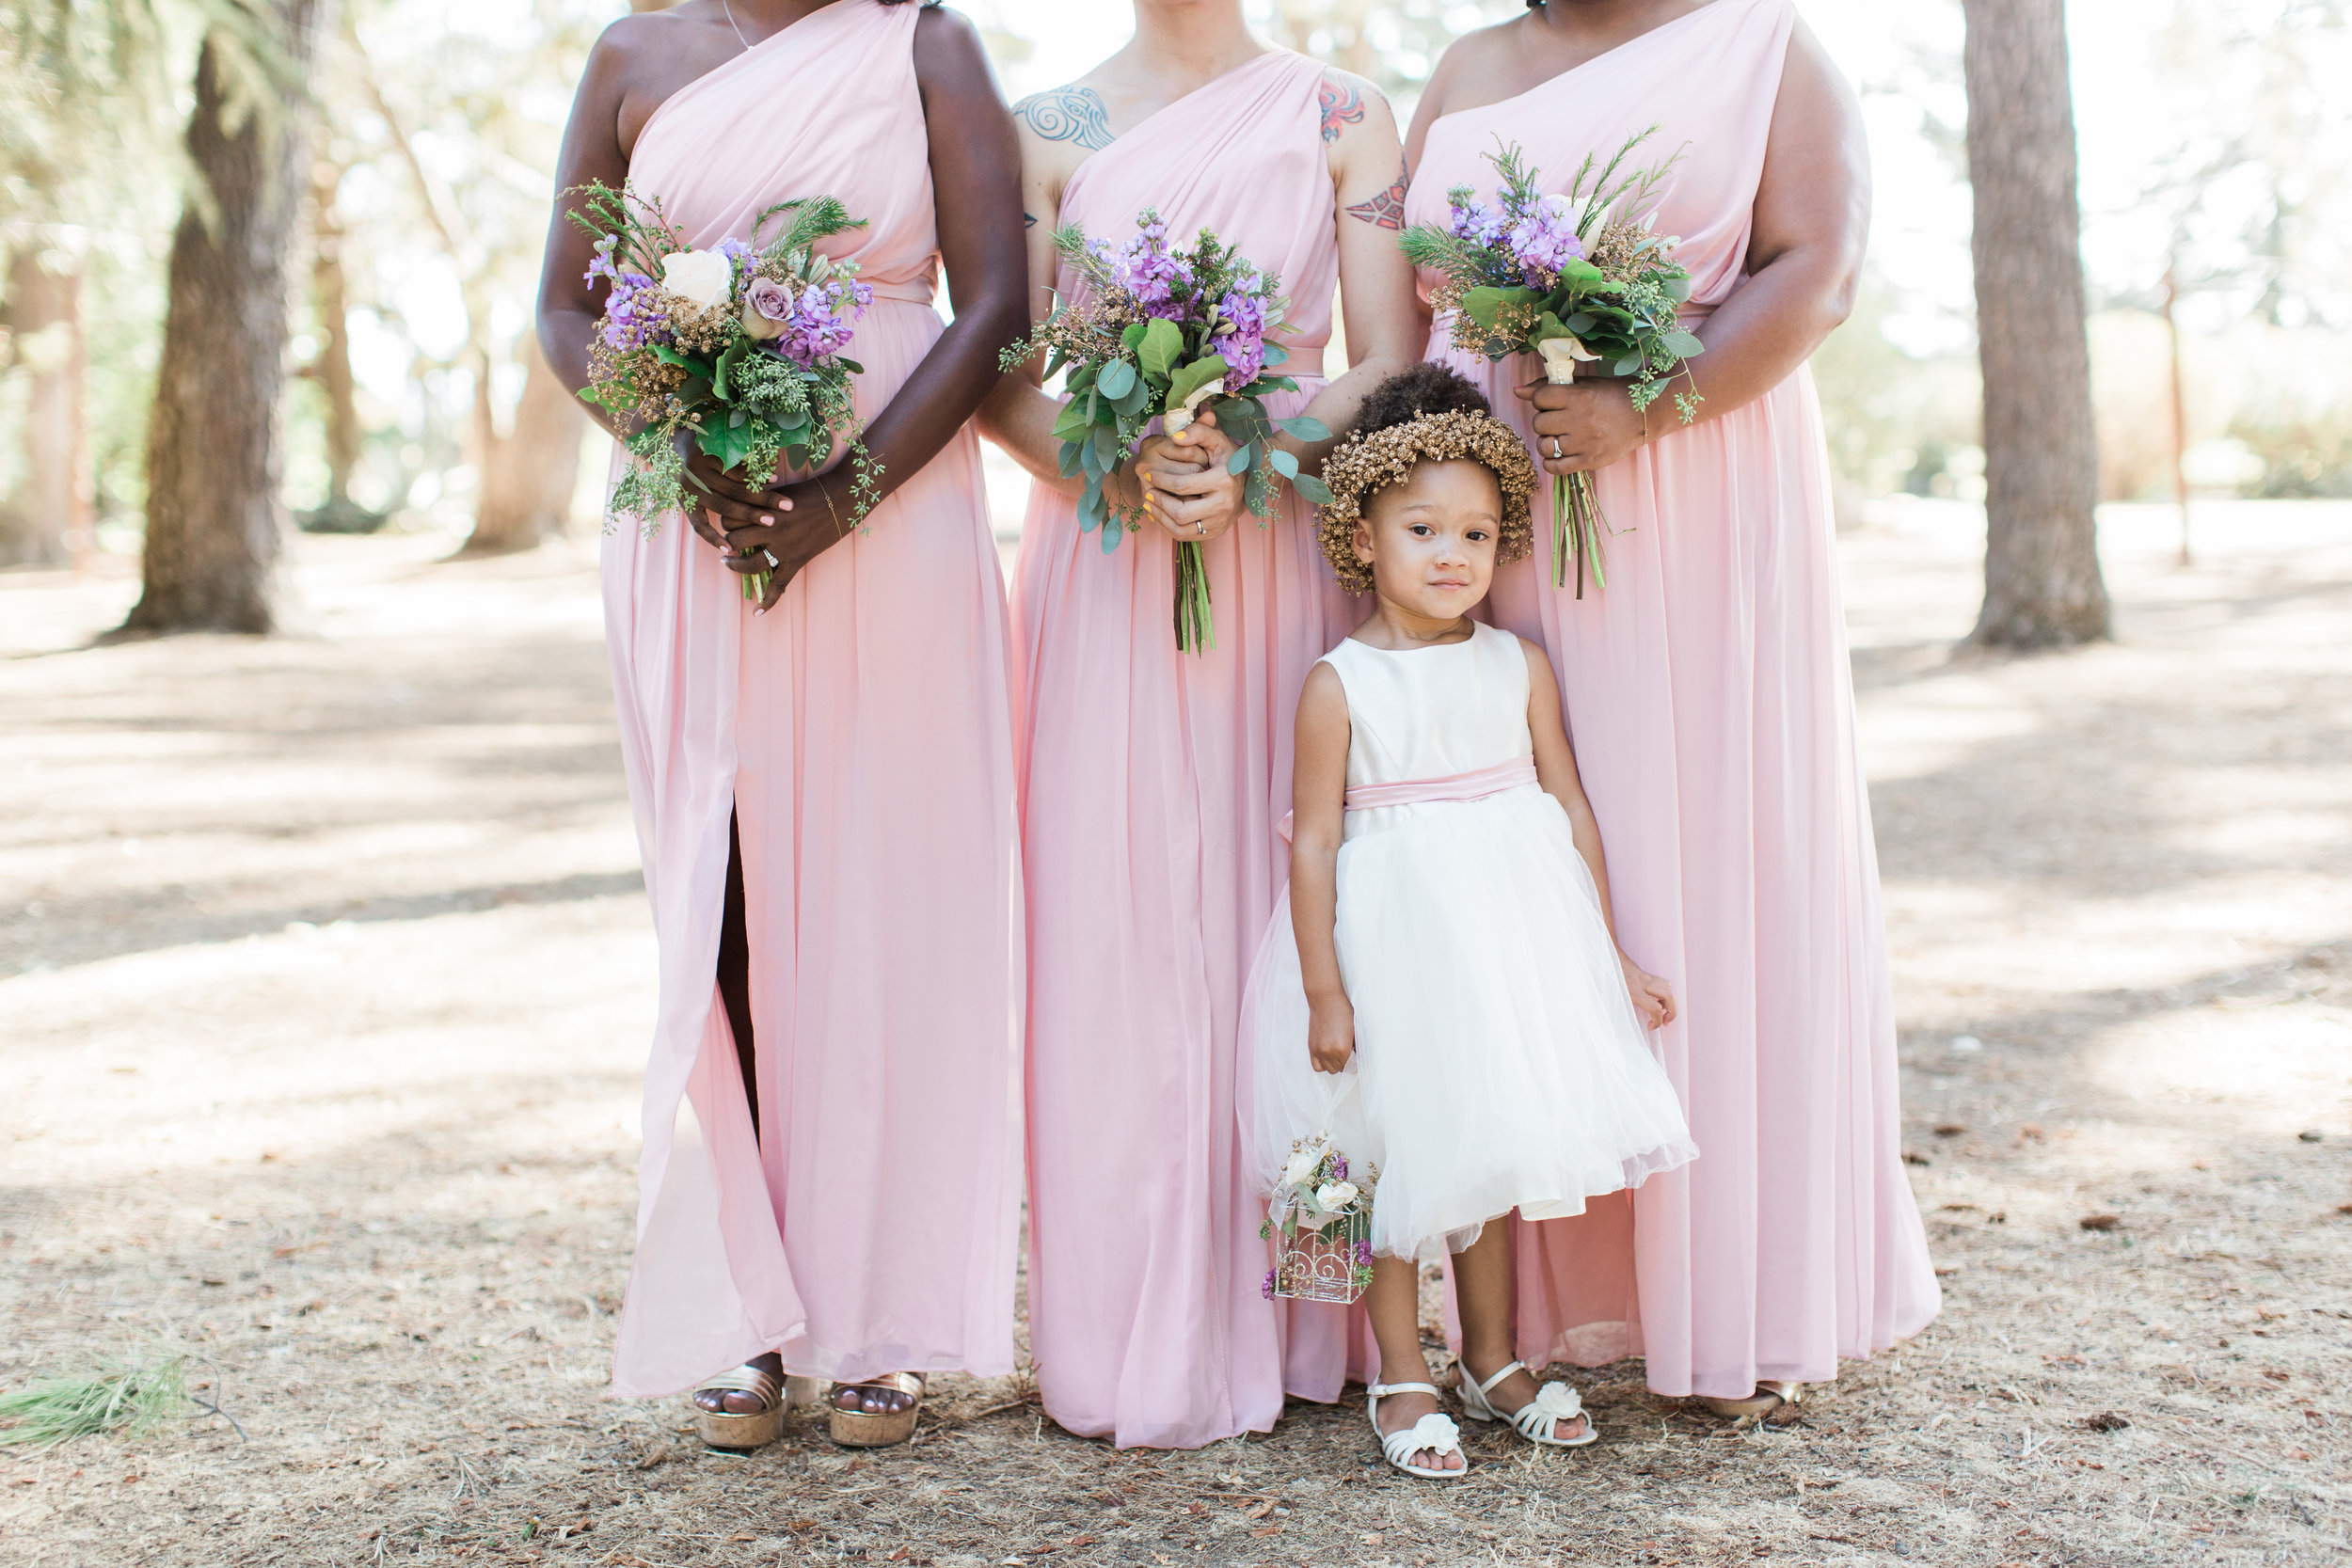 Jenny Quicksall Photography_www.jennyquicksall.com_California Wedding Photographer_Highland Springs Ranch and Inn Resort_Cherry Valley California (21).JPG